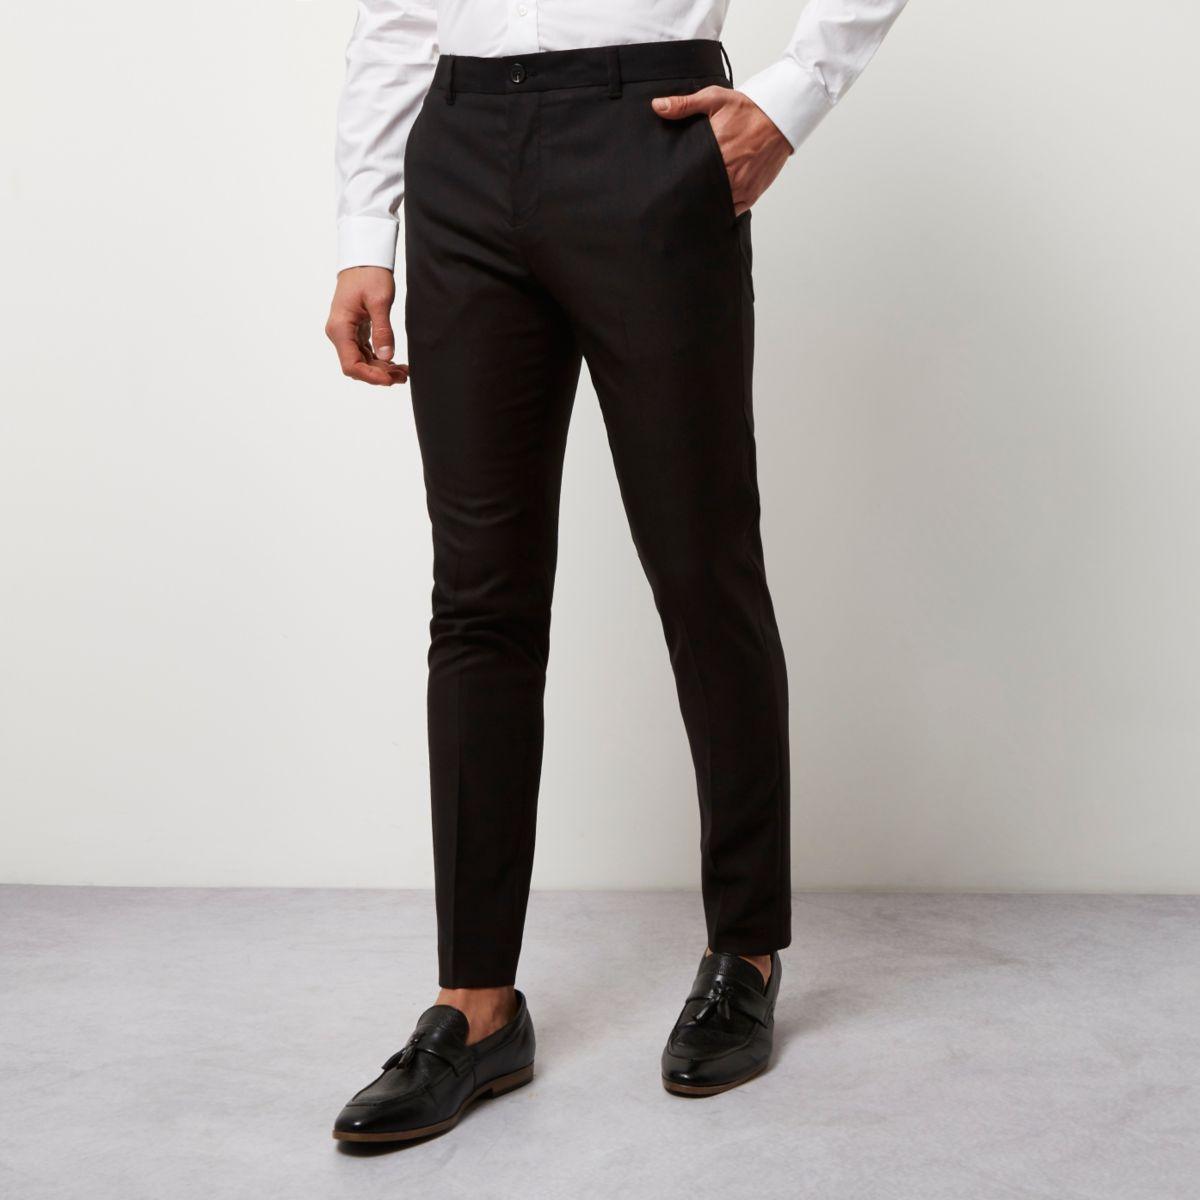 Schwarze, elegante Skinny Hose